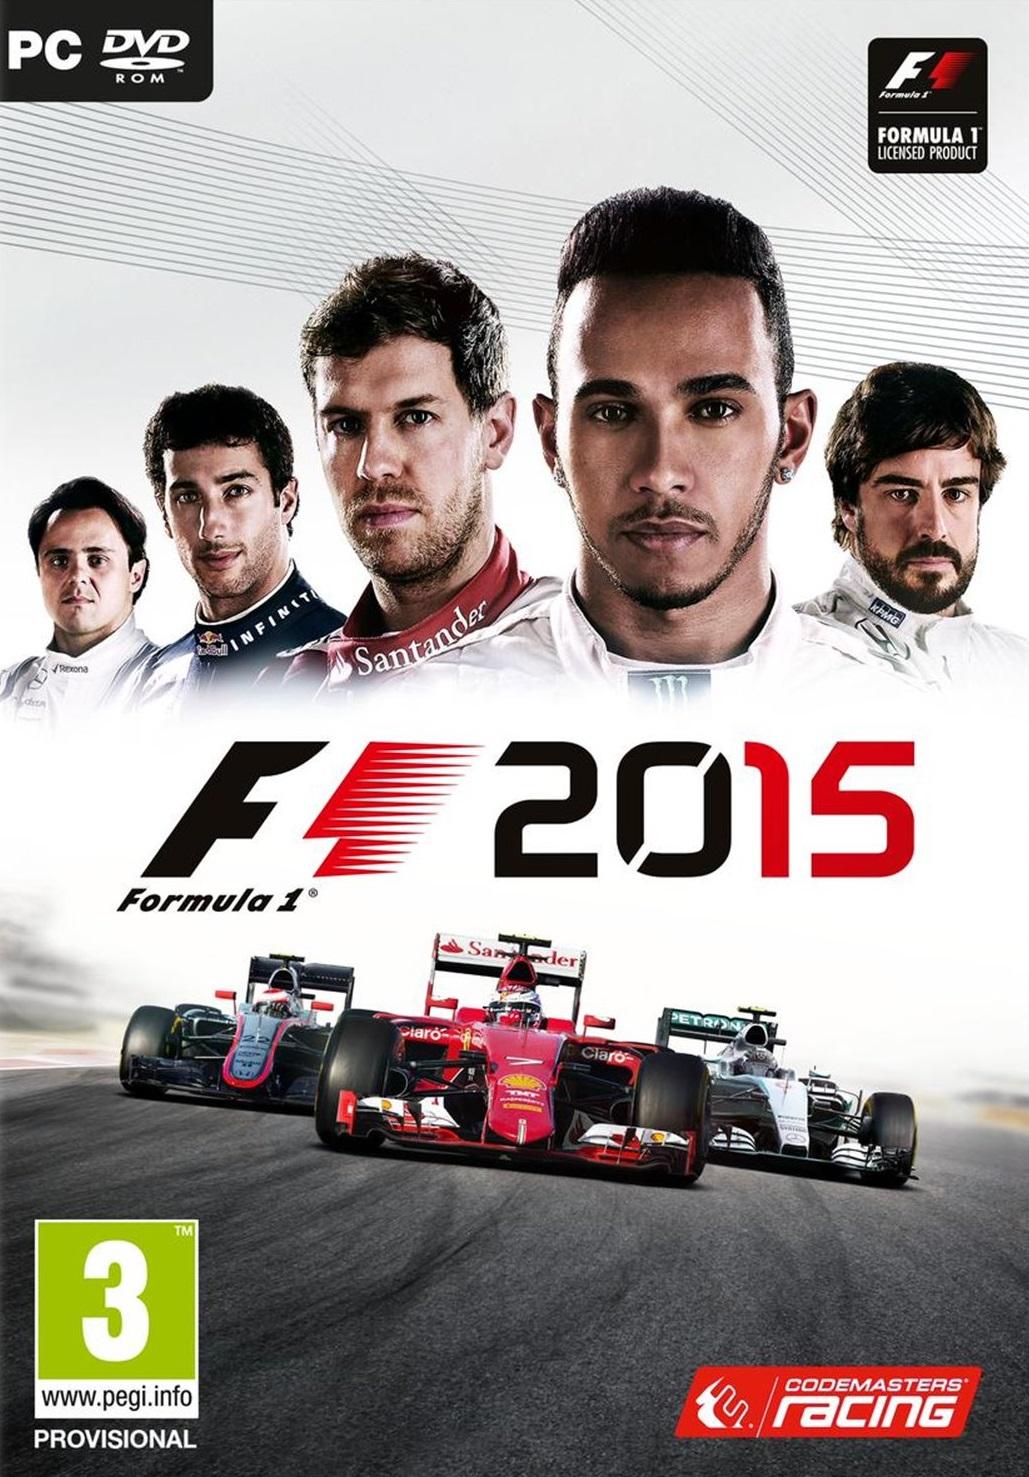 F1 2015 ESPAÑOL PC Full Cover Caratula